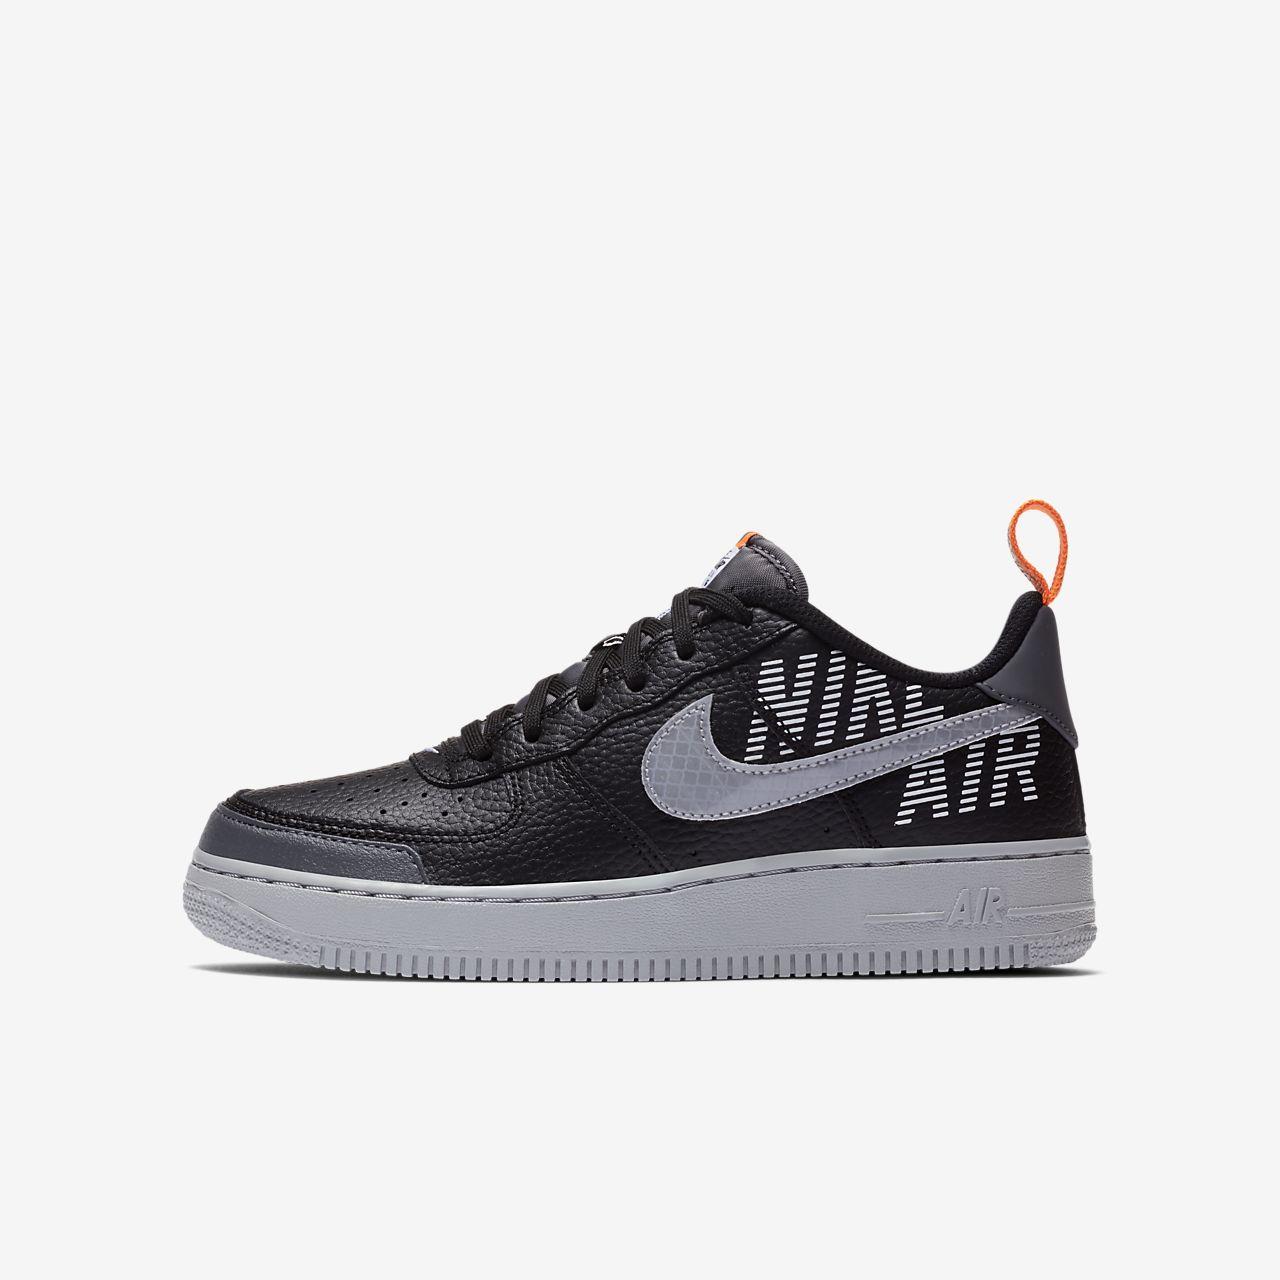 Calzado para niños talla grande Nike Air Force 1 LV8 2